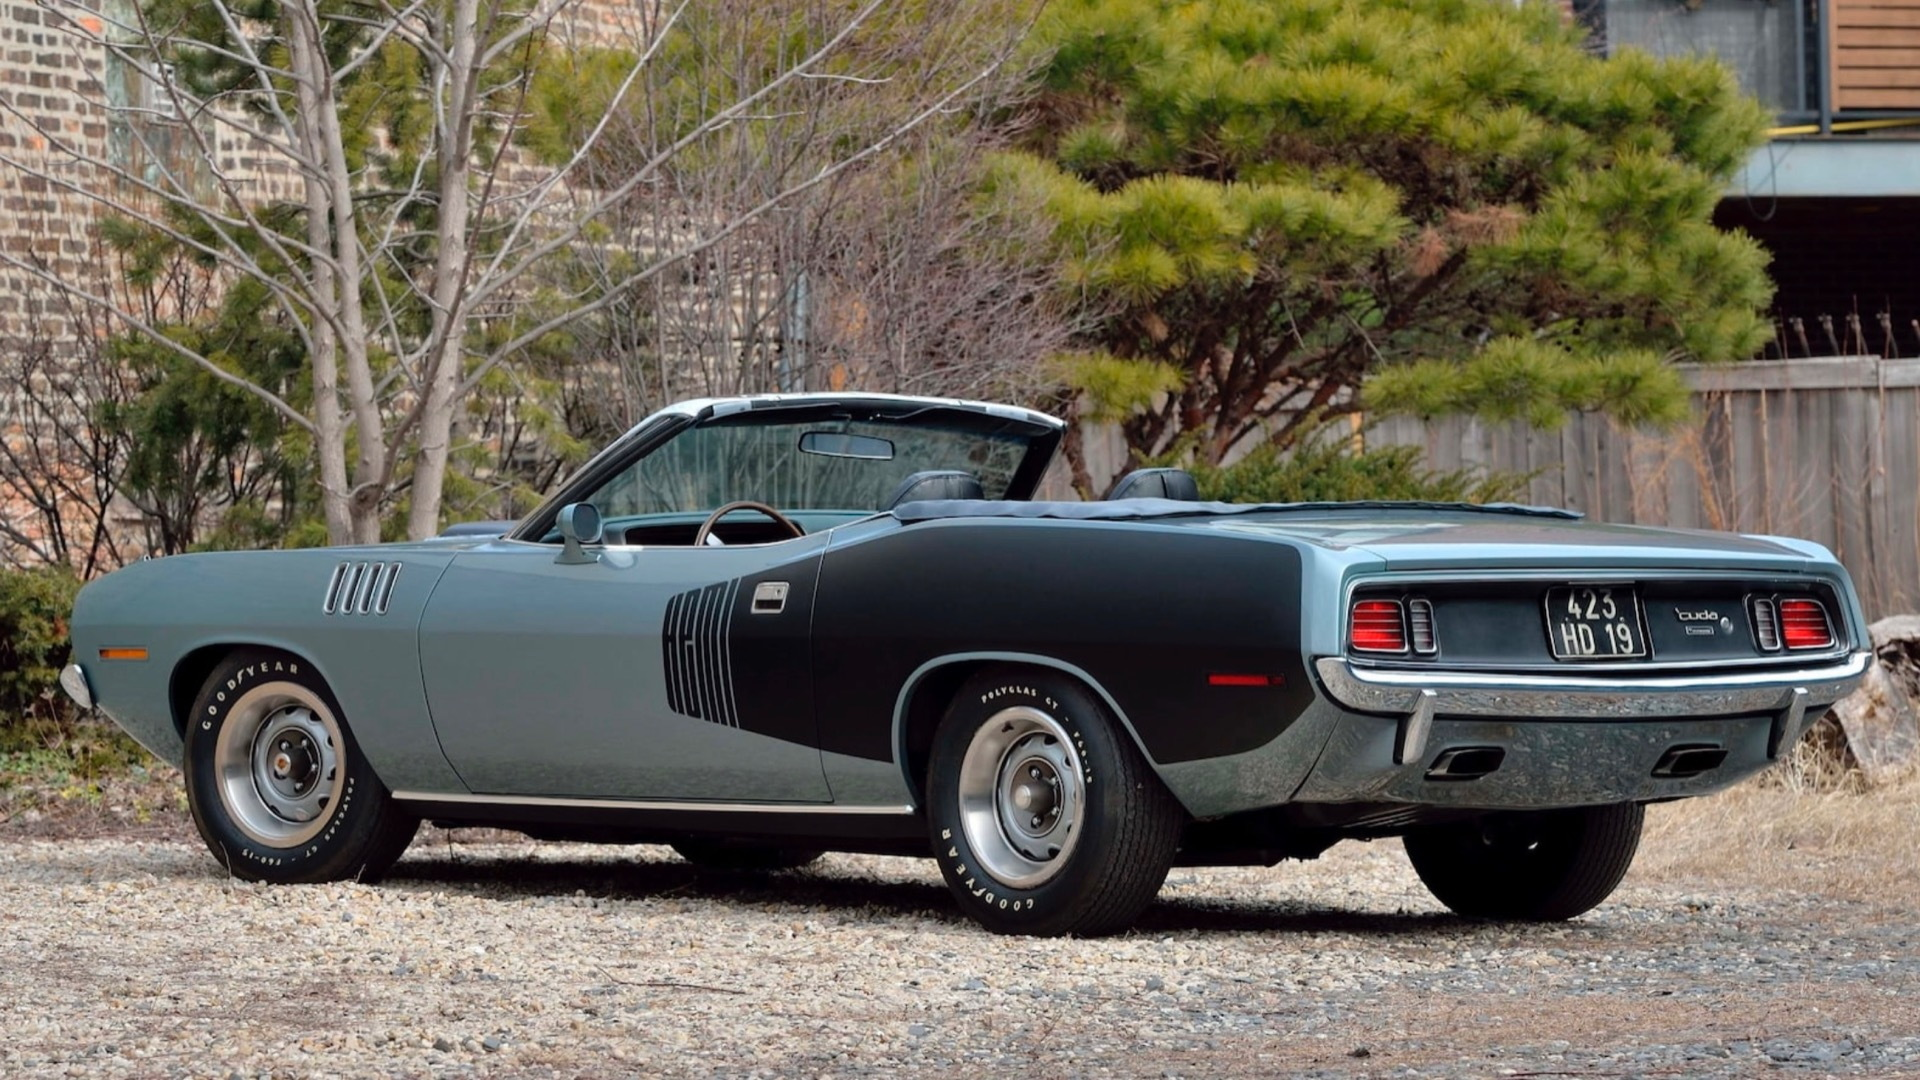 1971 Plymouth Hemi 'Cuda Convertible (Photo by Mecum Auctions)